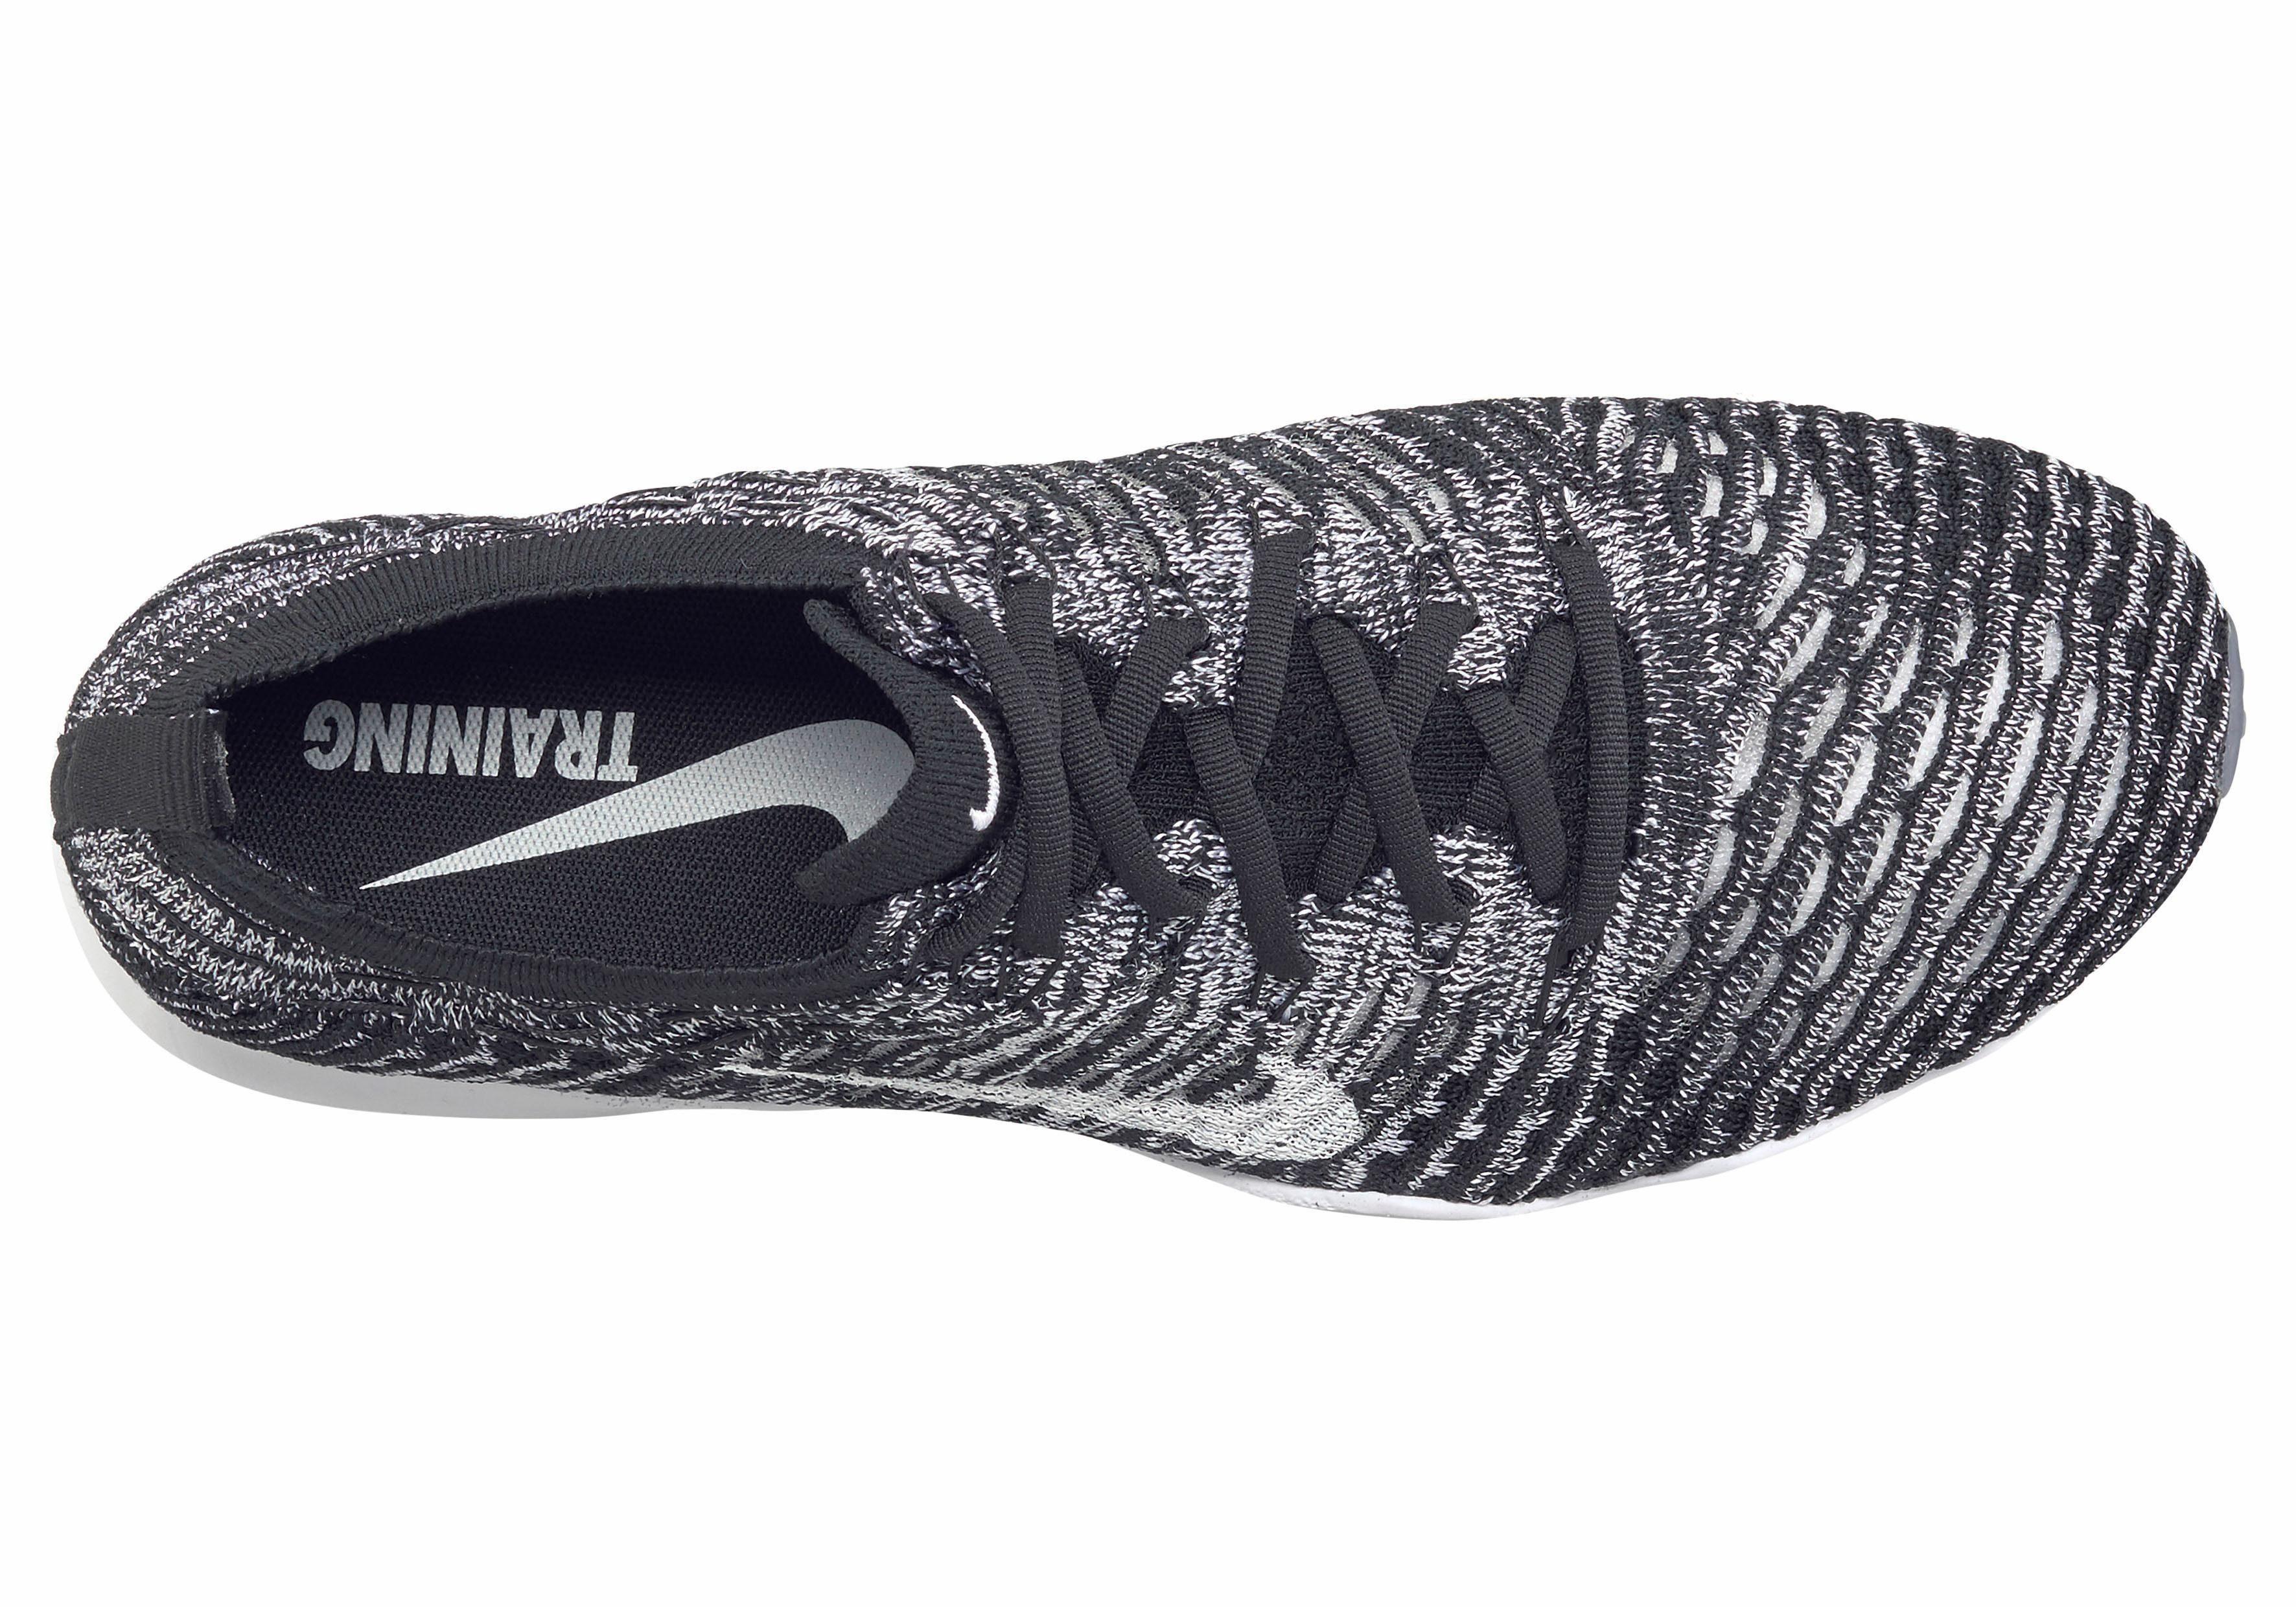 Nike Wmns Air Zoom Fearless Flyknit Fitnessschuh  schwarz-weiß